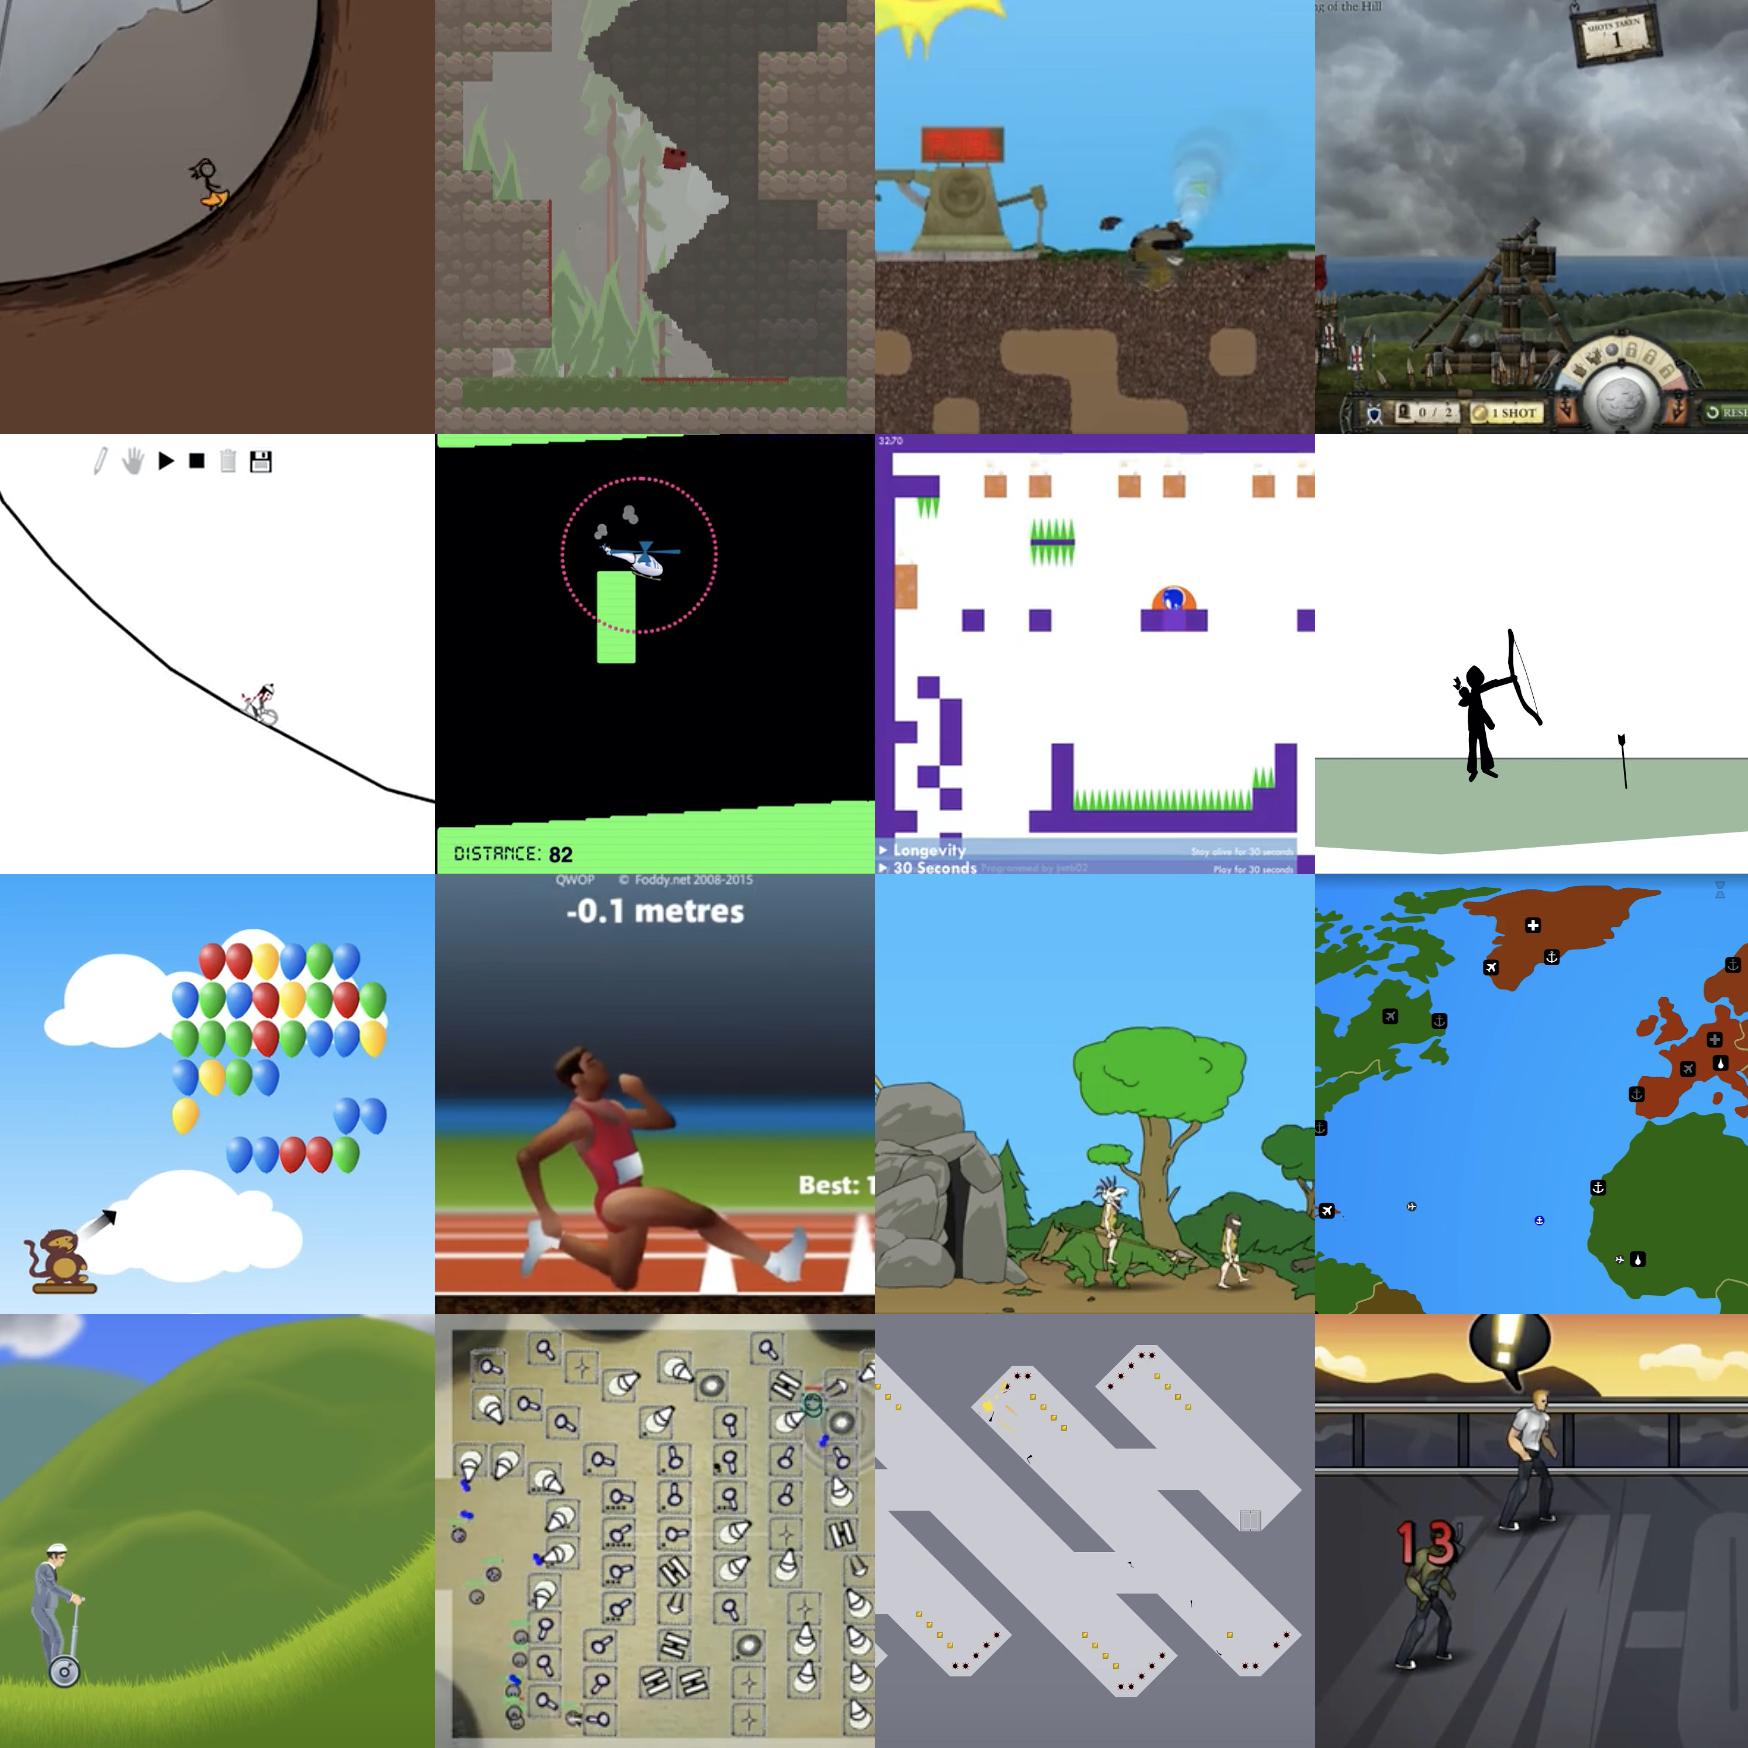 GAMES DESIGN, ANIMATION, VFX & ESPORTS - cover